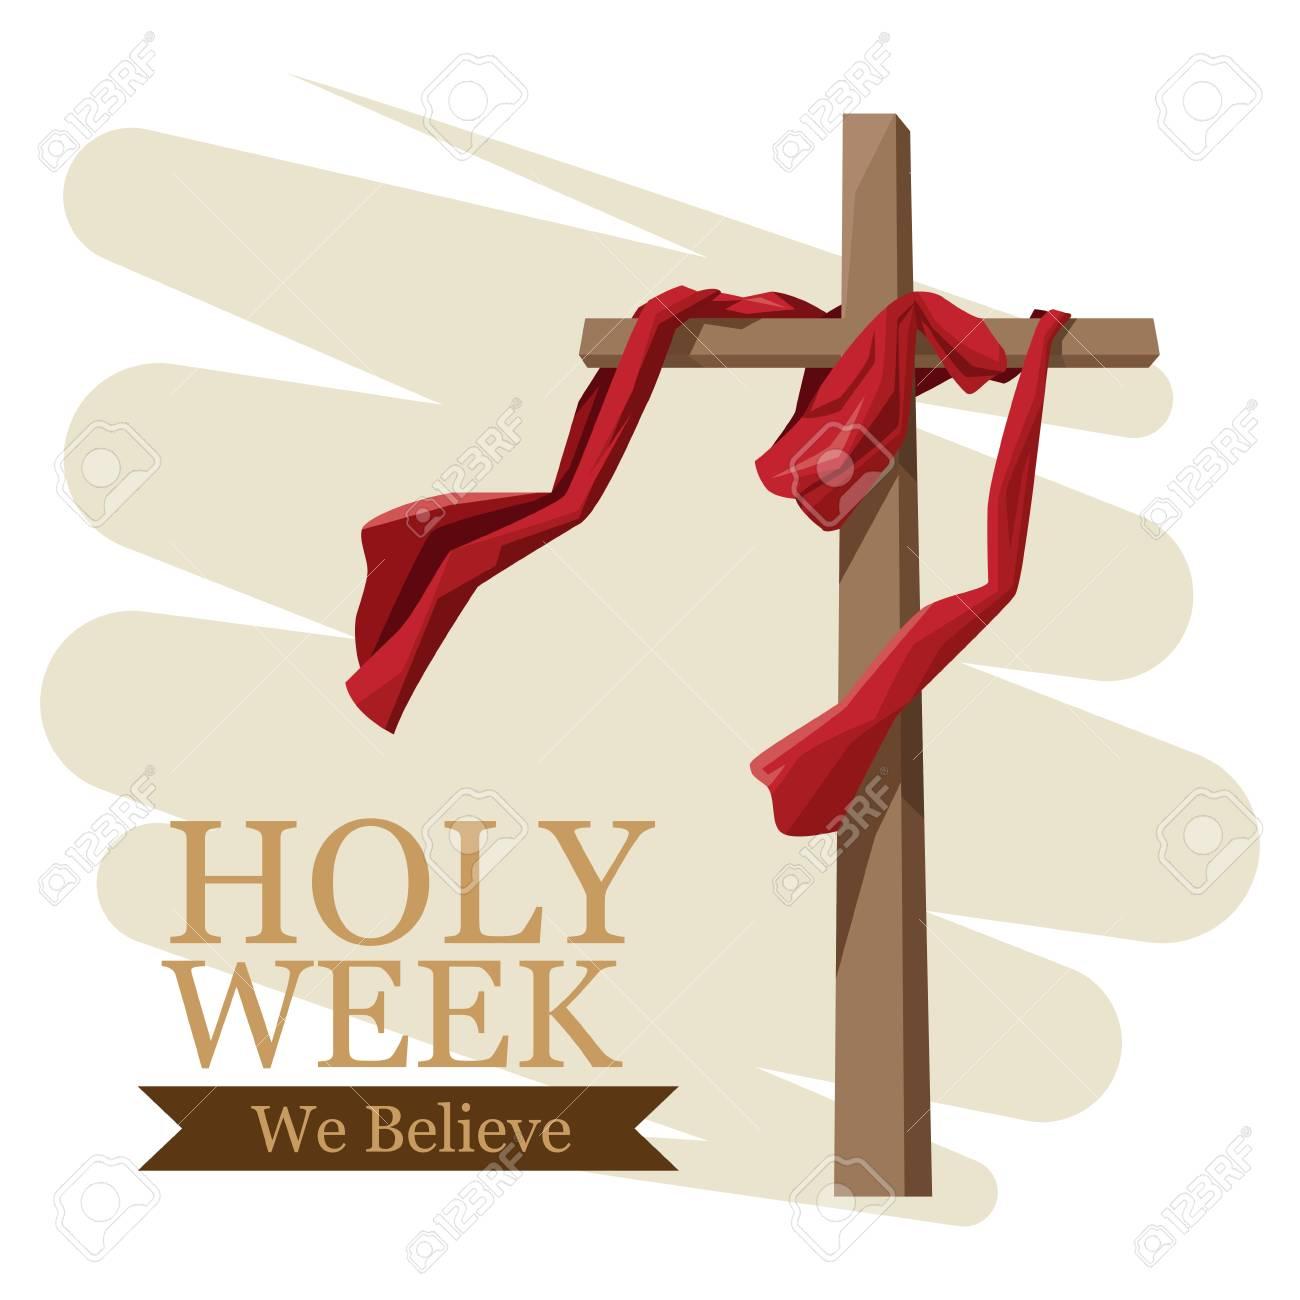 Holy week catholic tradition icon vector illustration graphic design - 94143093